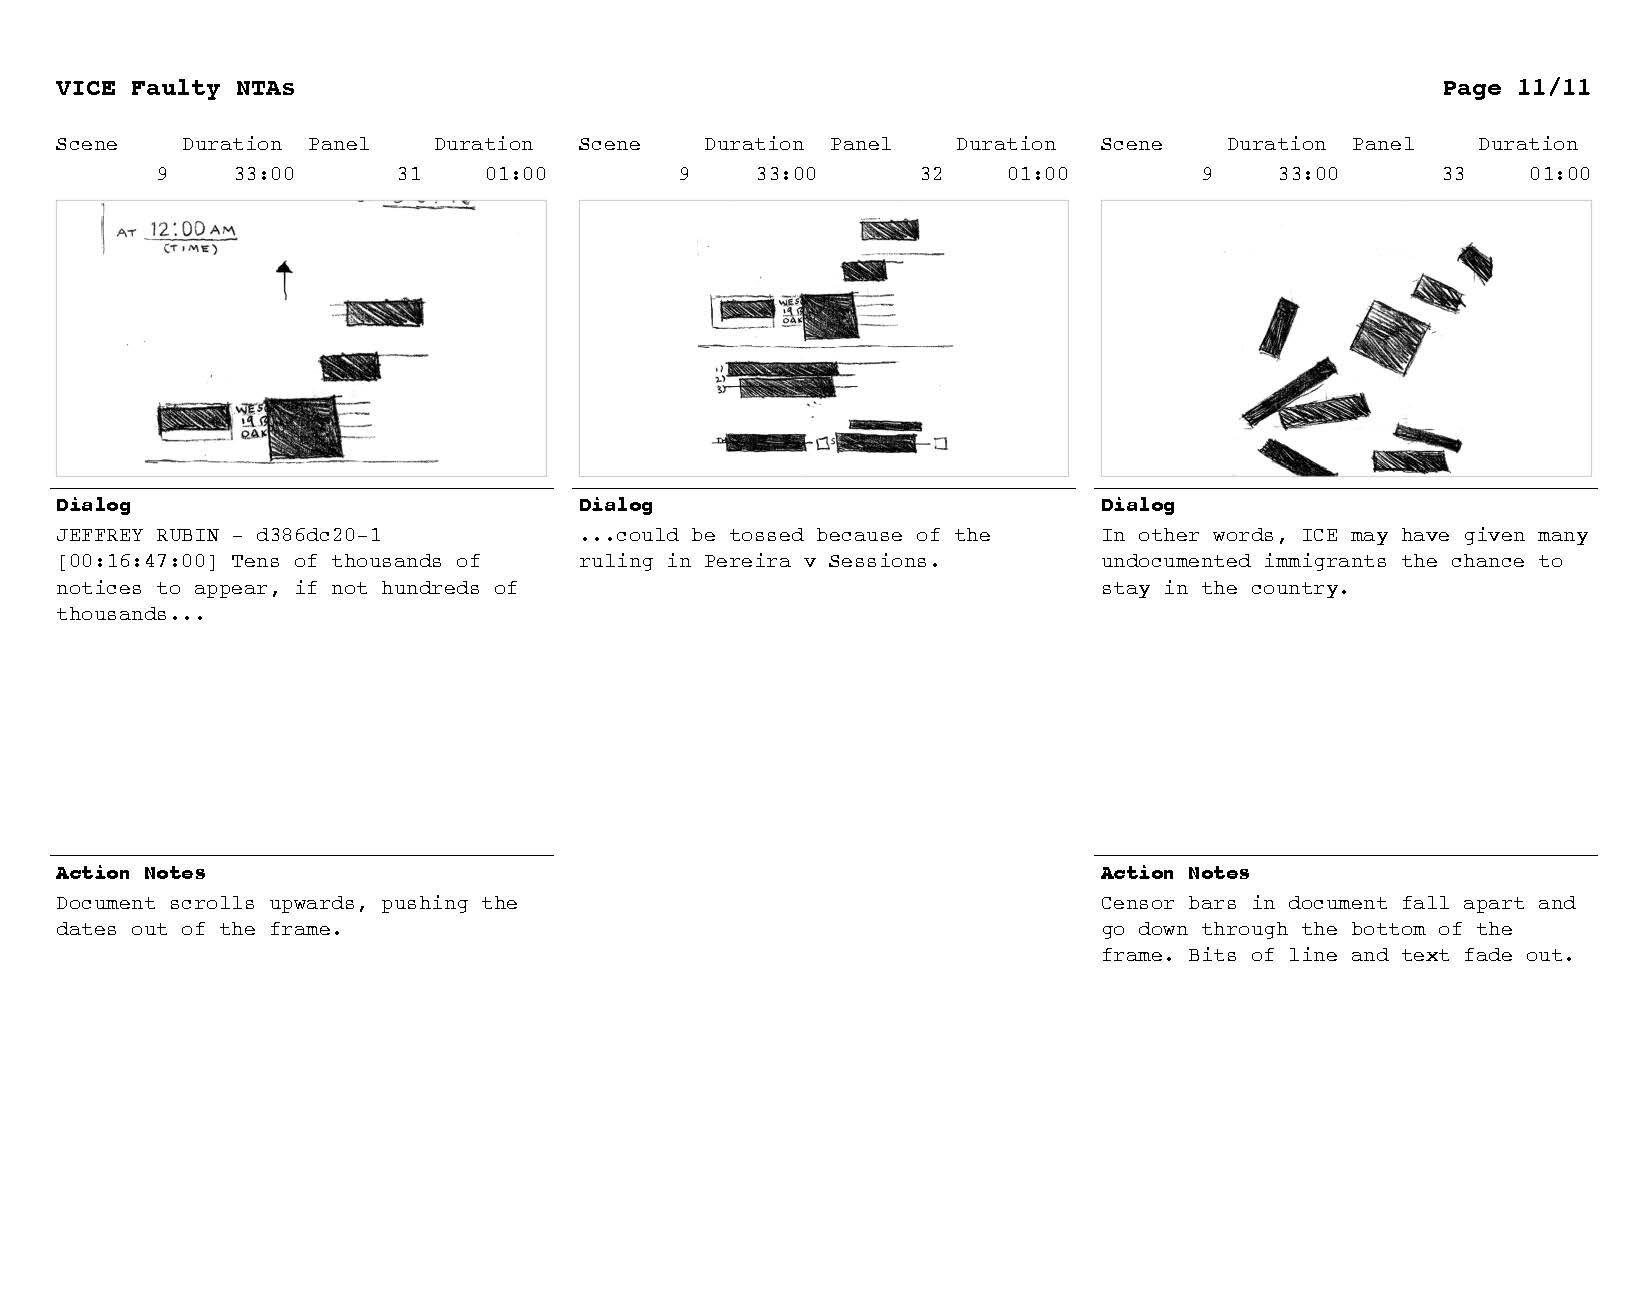 VICE News Tonight - Faulty NTAs storyboard_Page_11.jpg